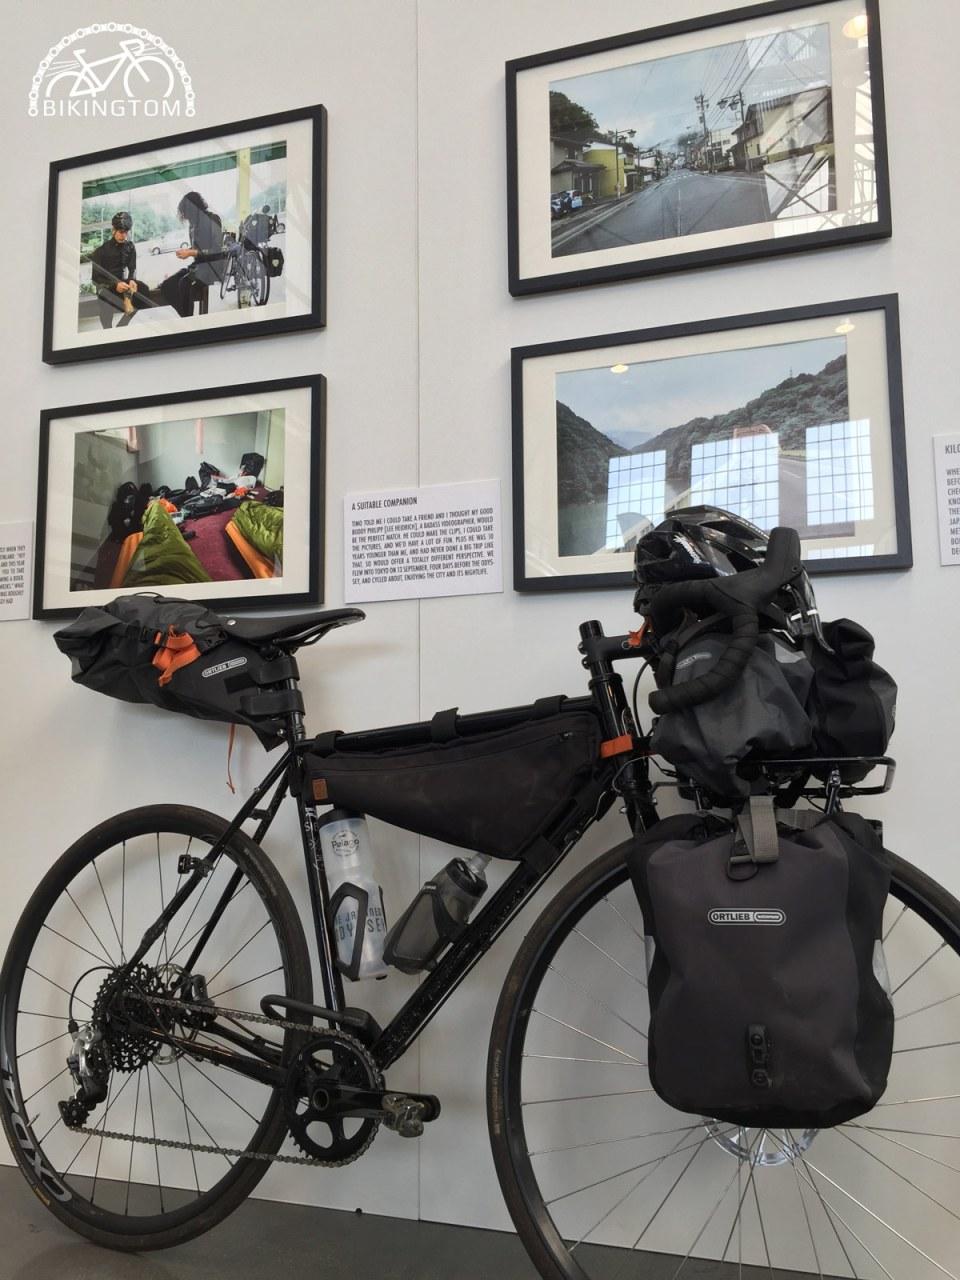 CYCLINGWORLD Düsseldorf,bikingtom,Messe, Fahrrad